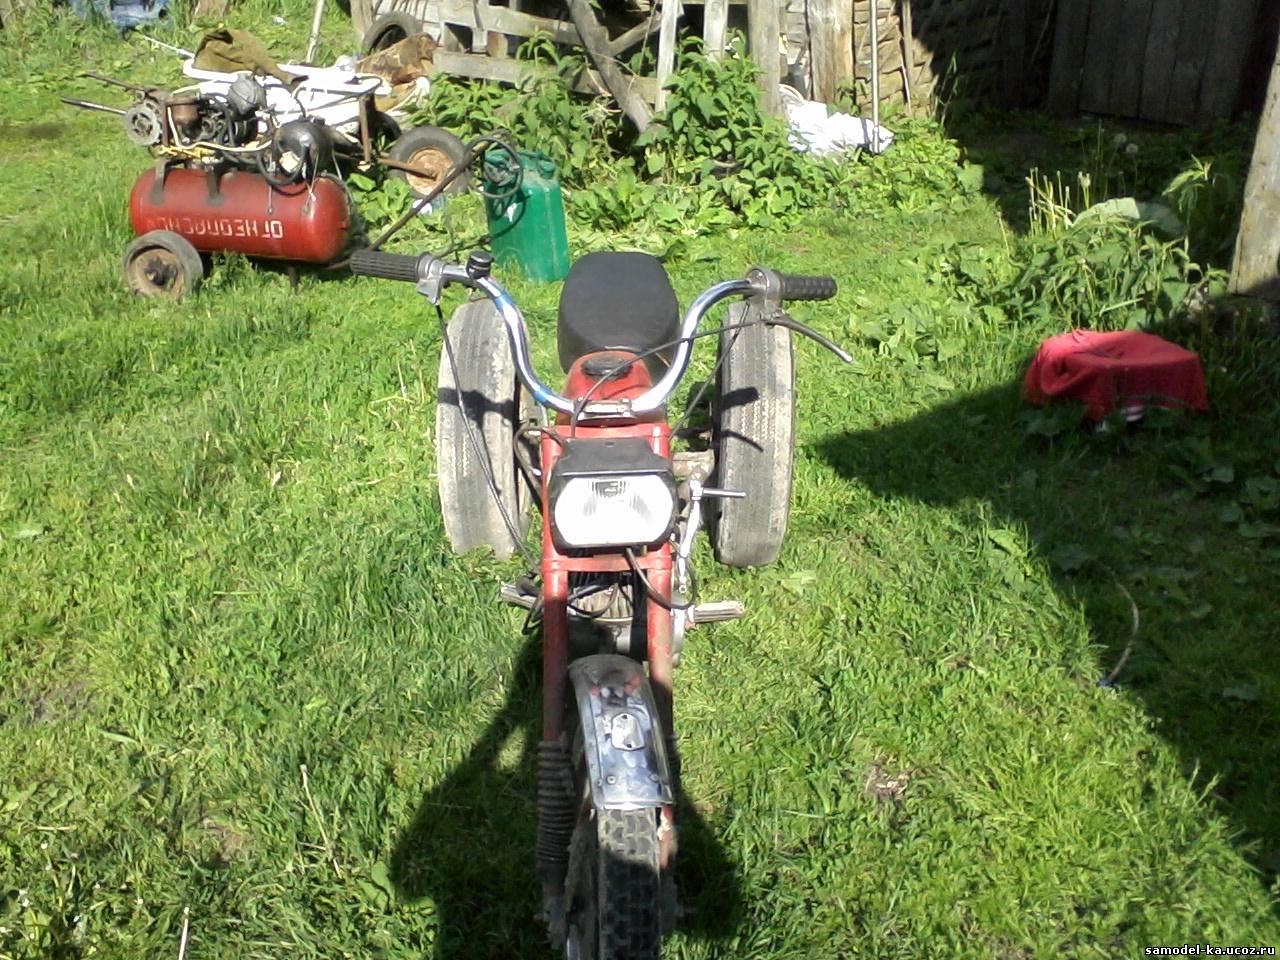 Трицикл своими руками фото